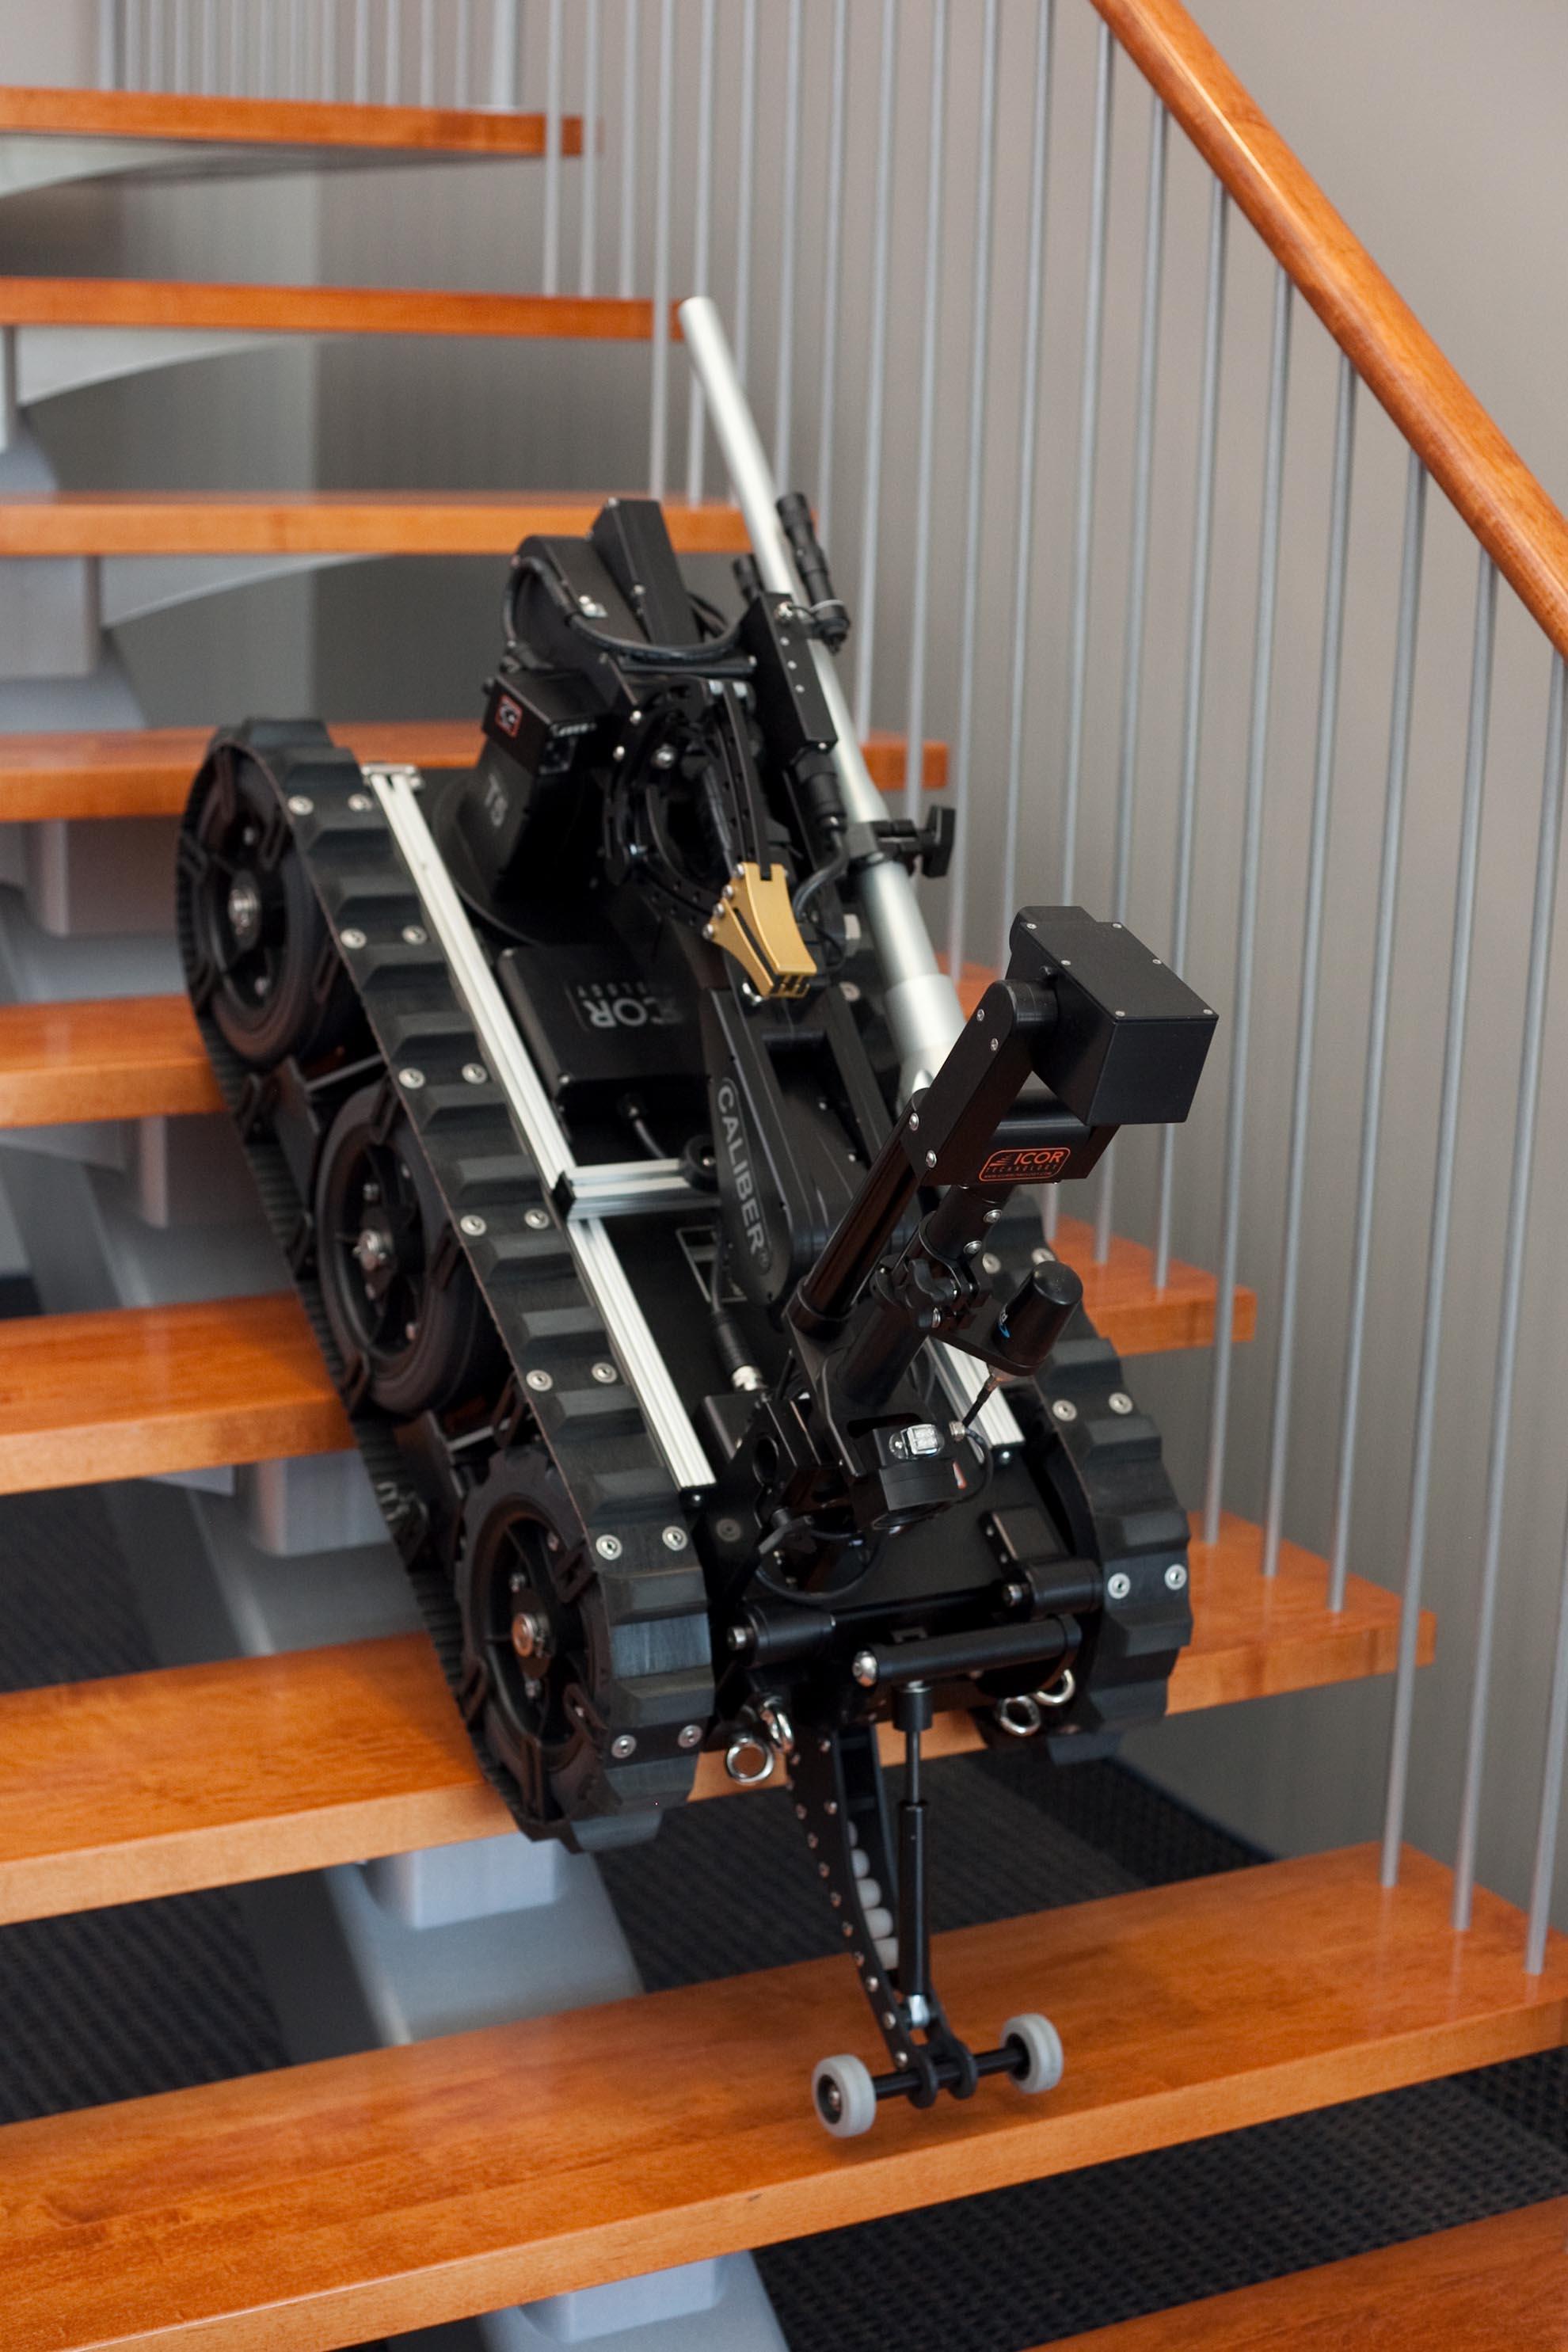 caliber-t5-swat-eod-robot-stair-climb